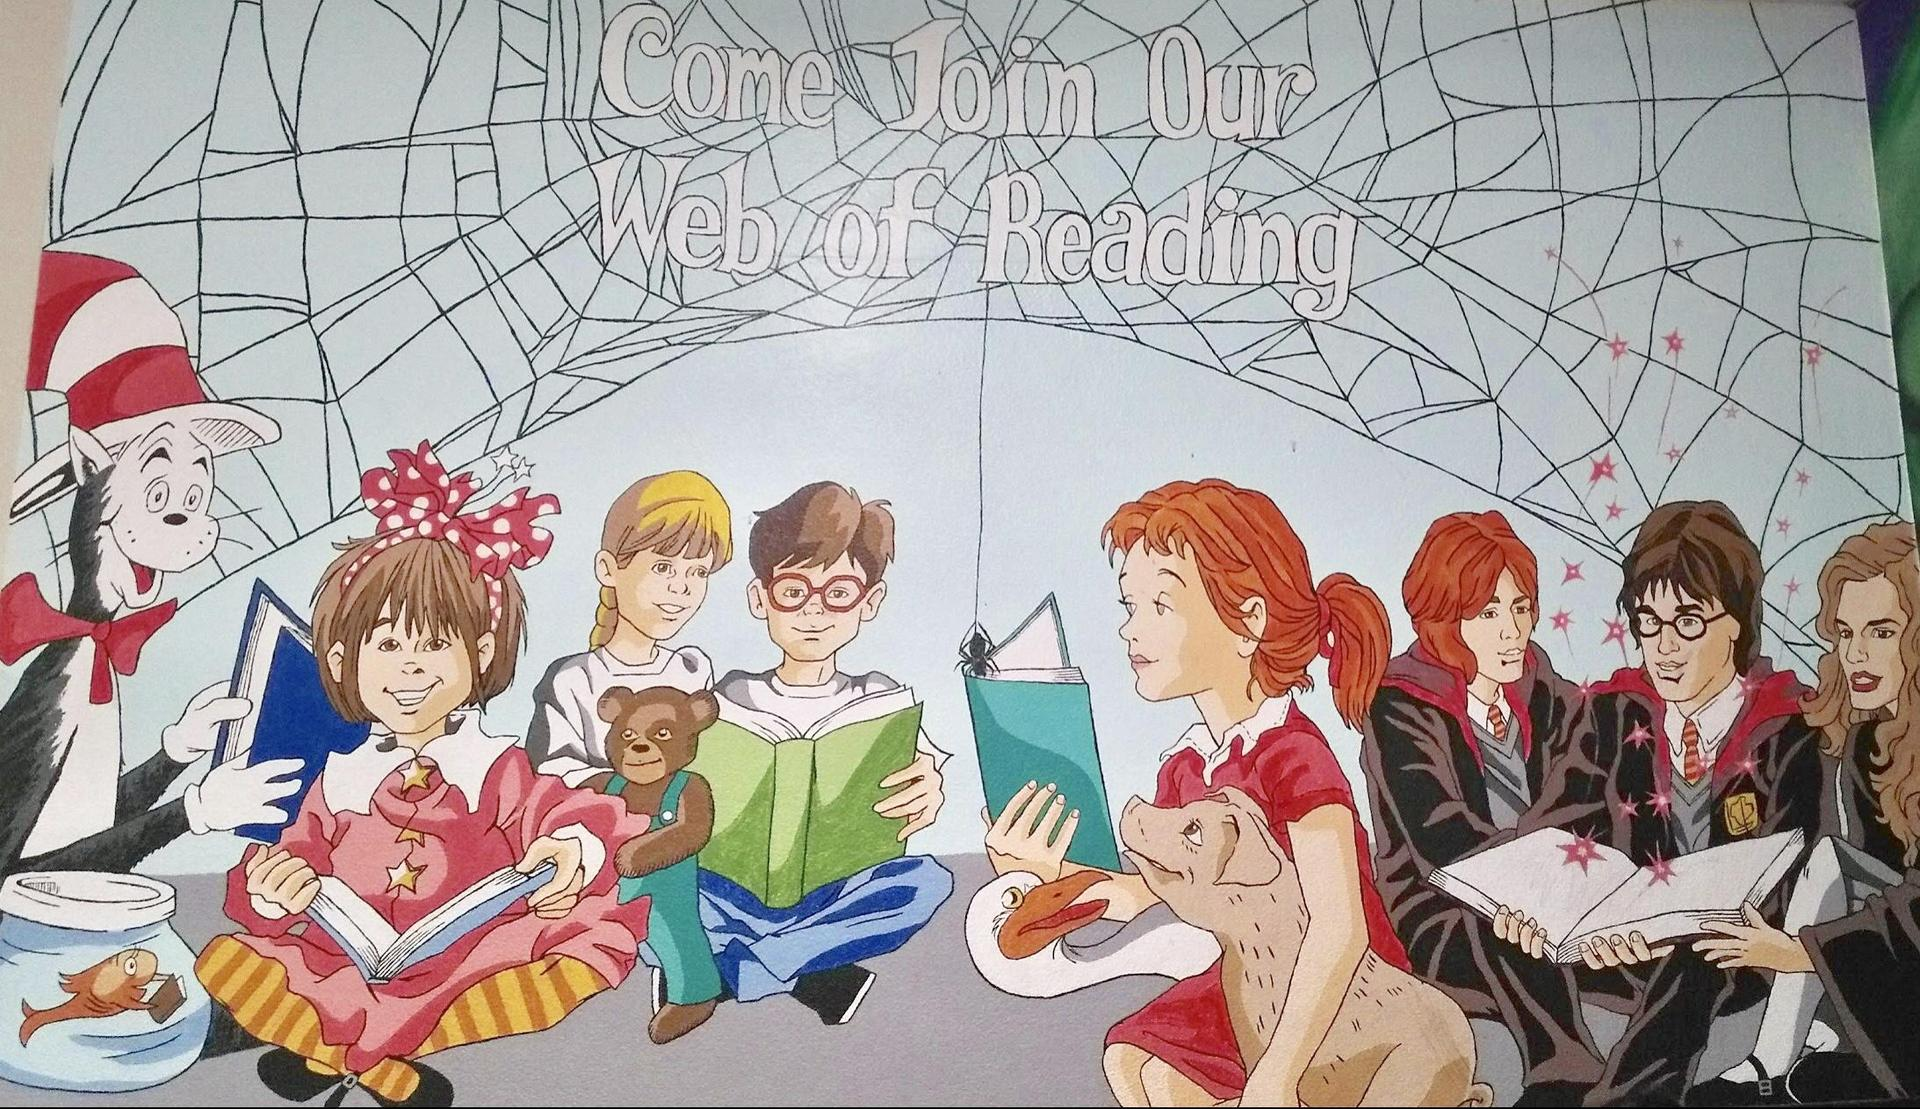 Web of reading